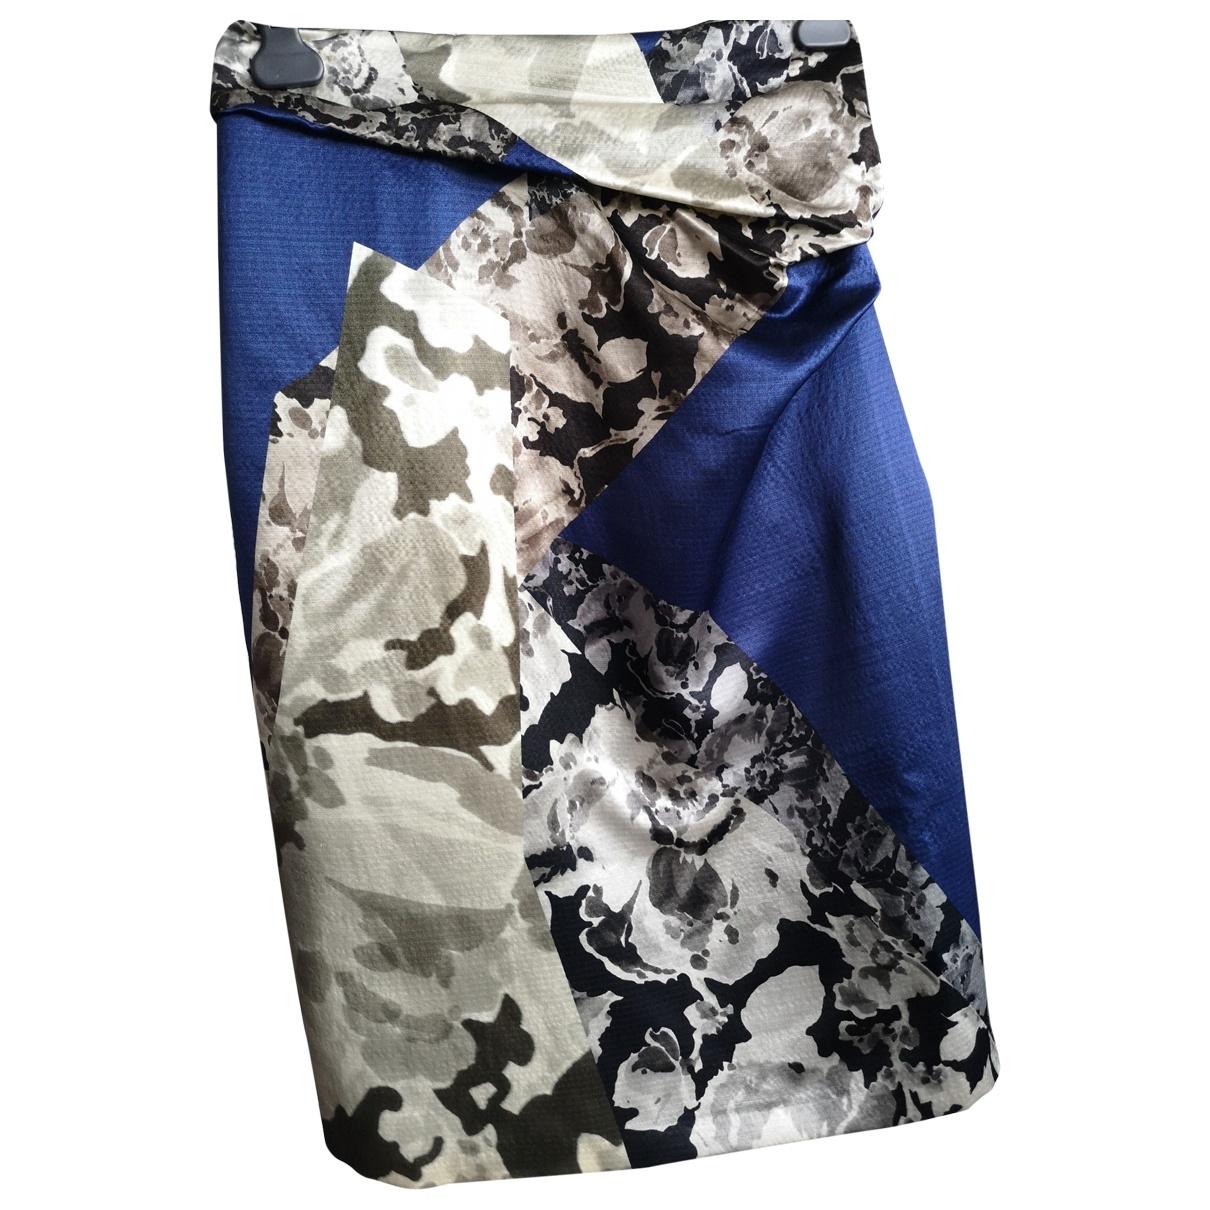 Dries Van Noten \N Wool skirt for Women 36 FR